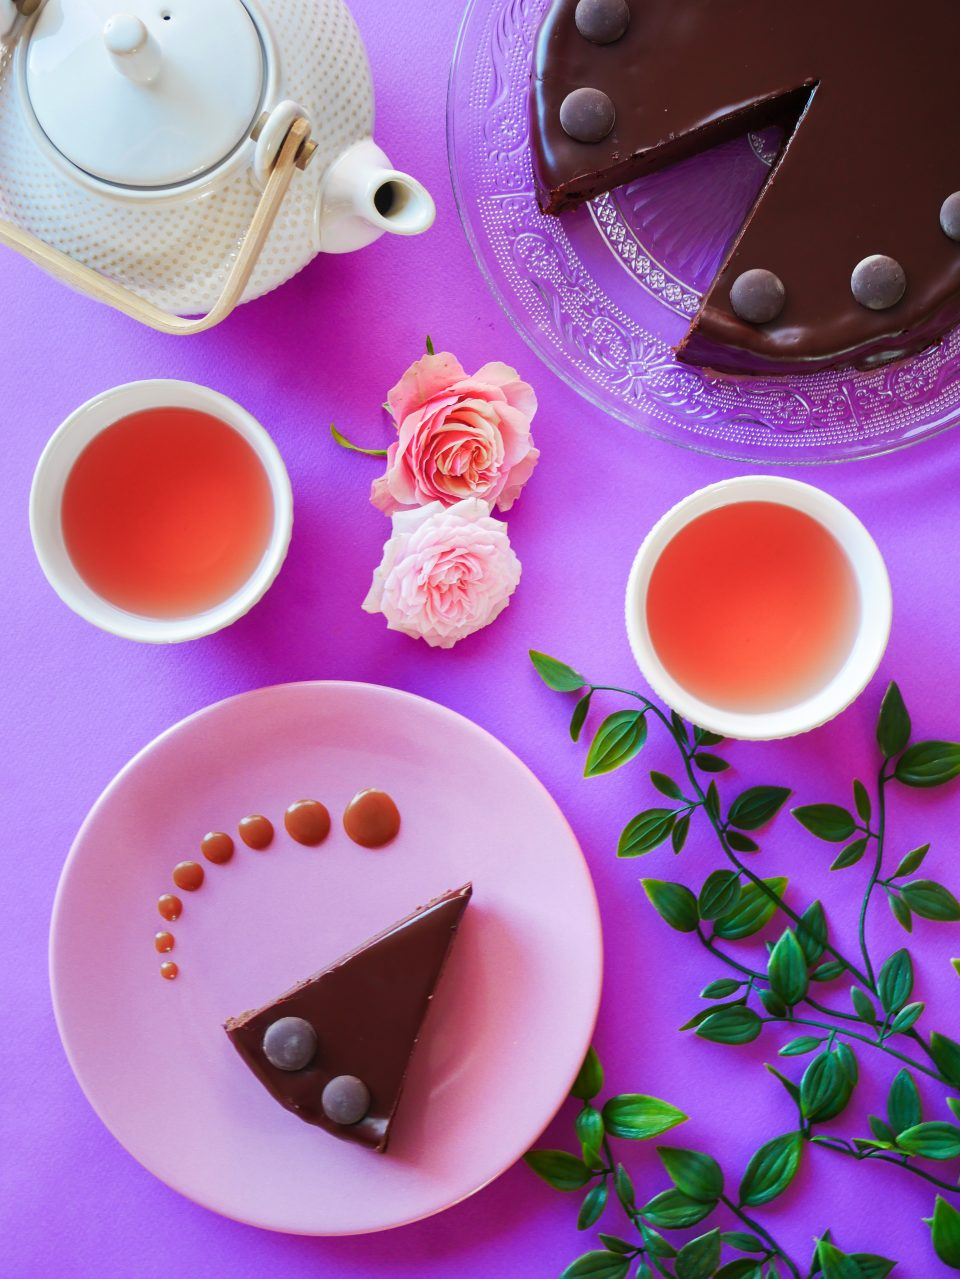 recette du gâteau au chocolat au mascarpone